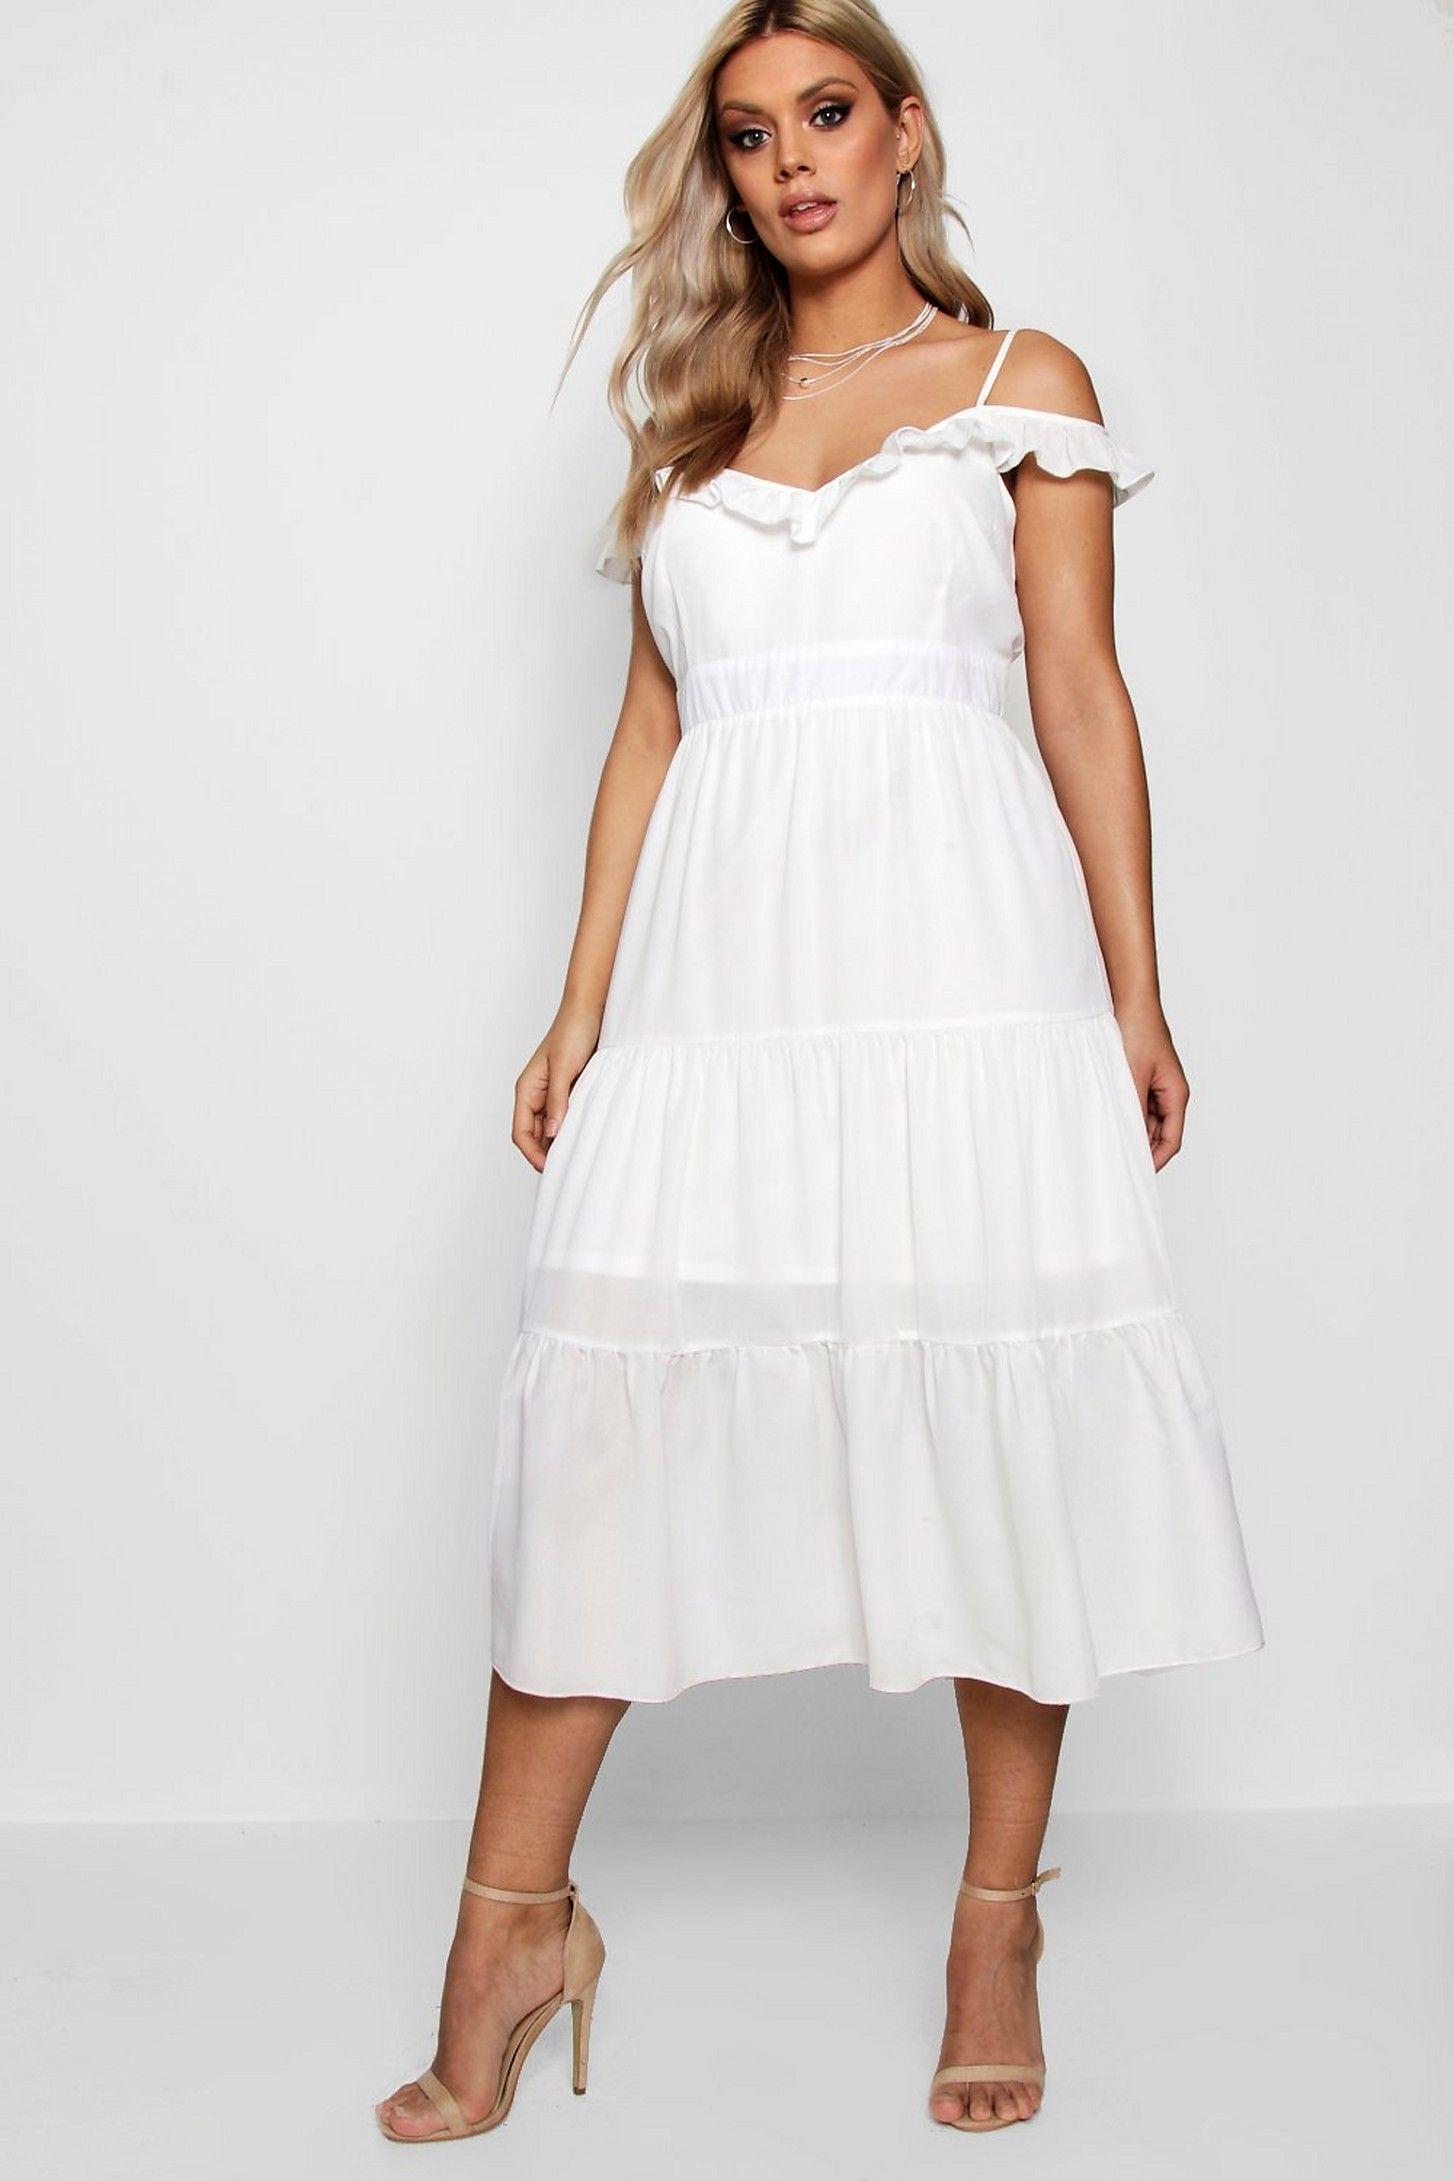 a88da39167d4 Plus Frill Detail Cold Shoulder Dress in 2019 | Dresses | Dresses ...